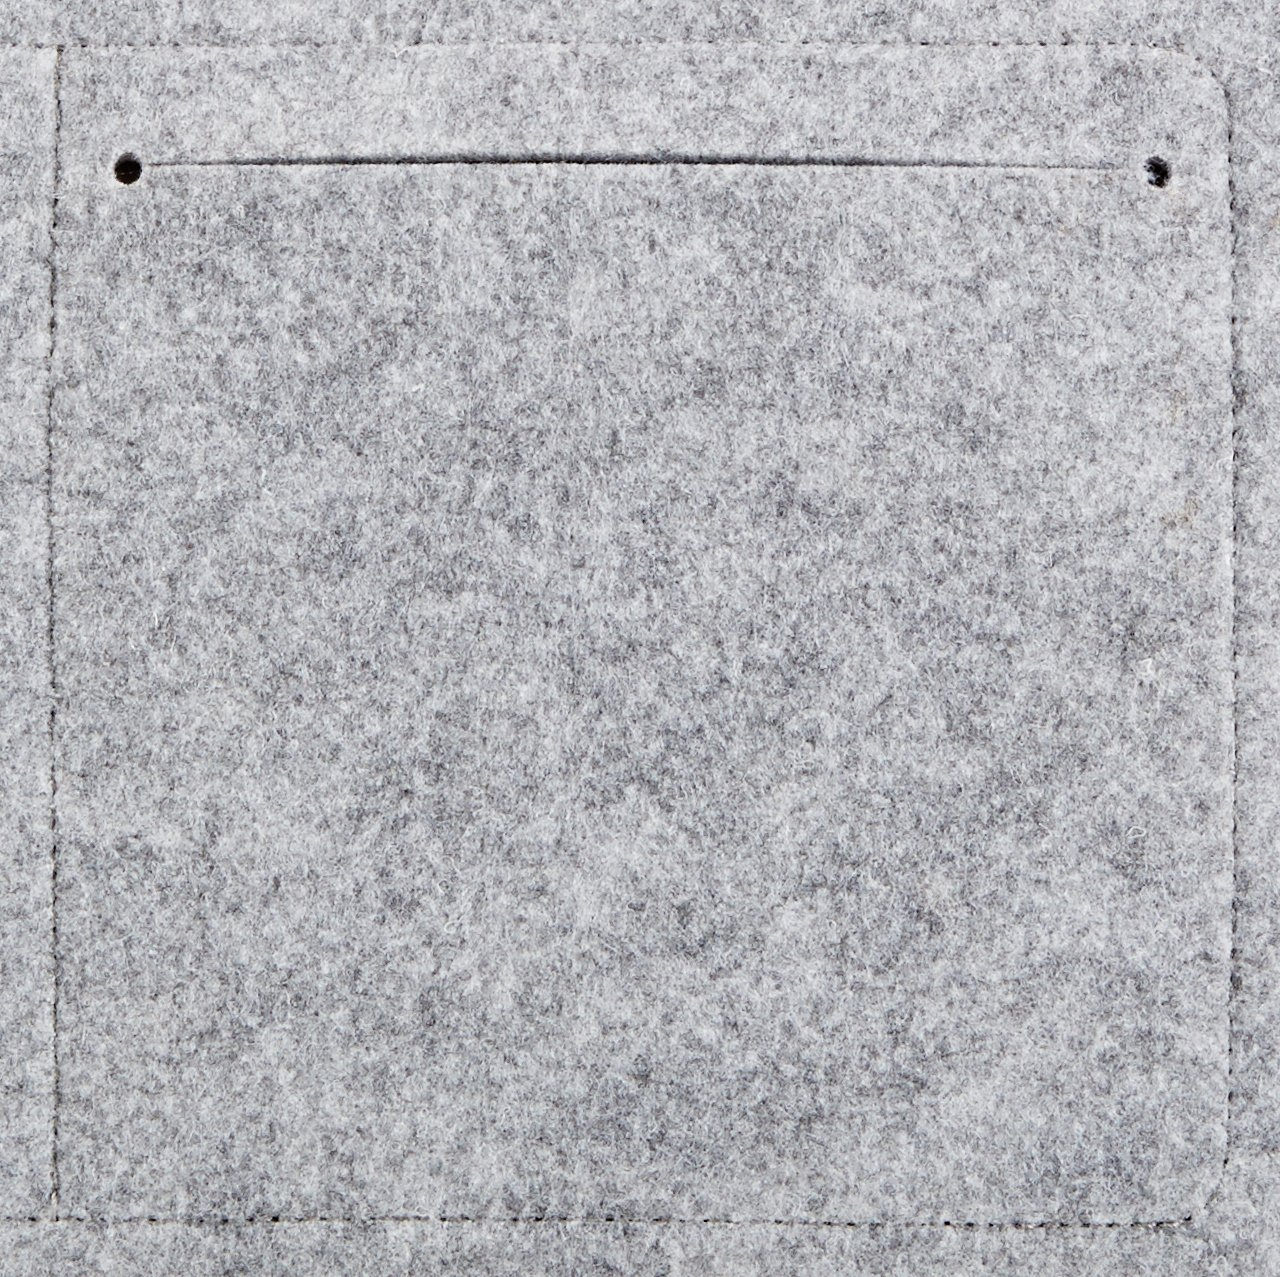 color gris claro Basics Funda de fieltro para port/átil de 11 pulgadas